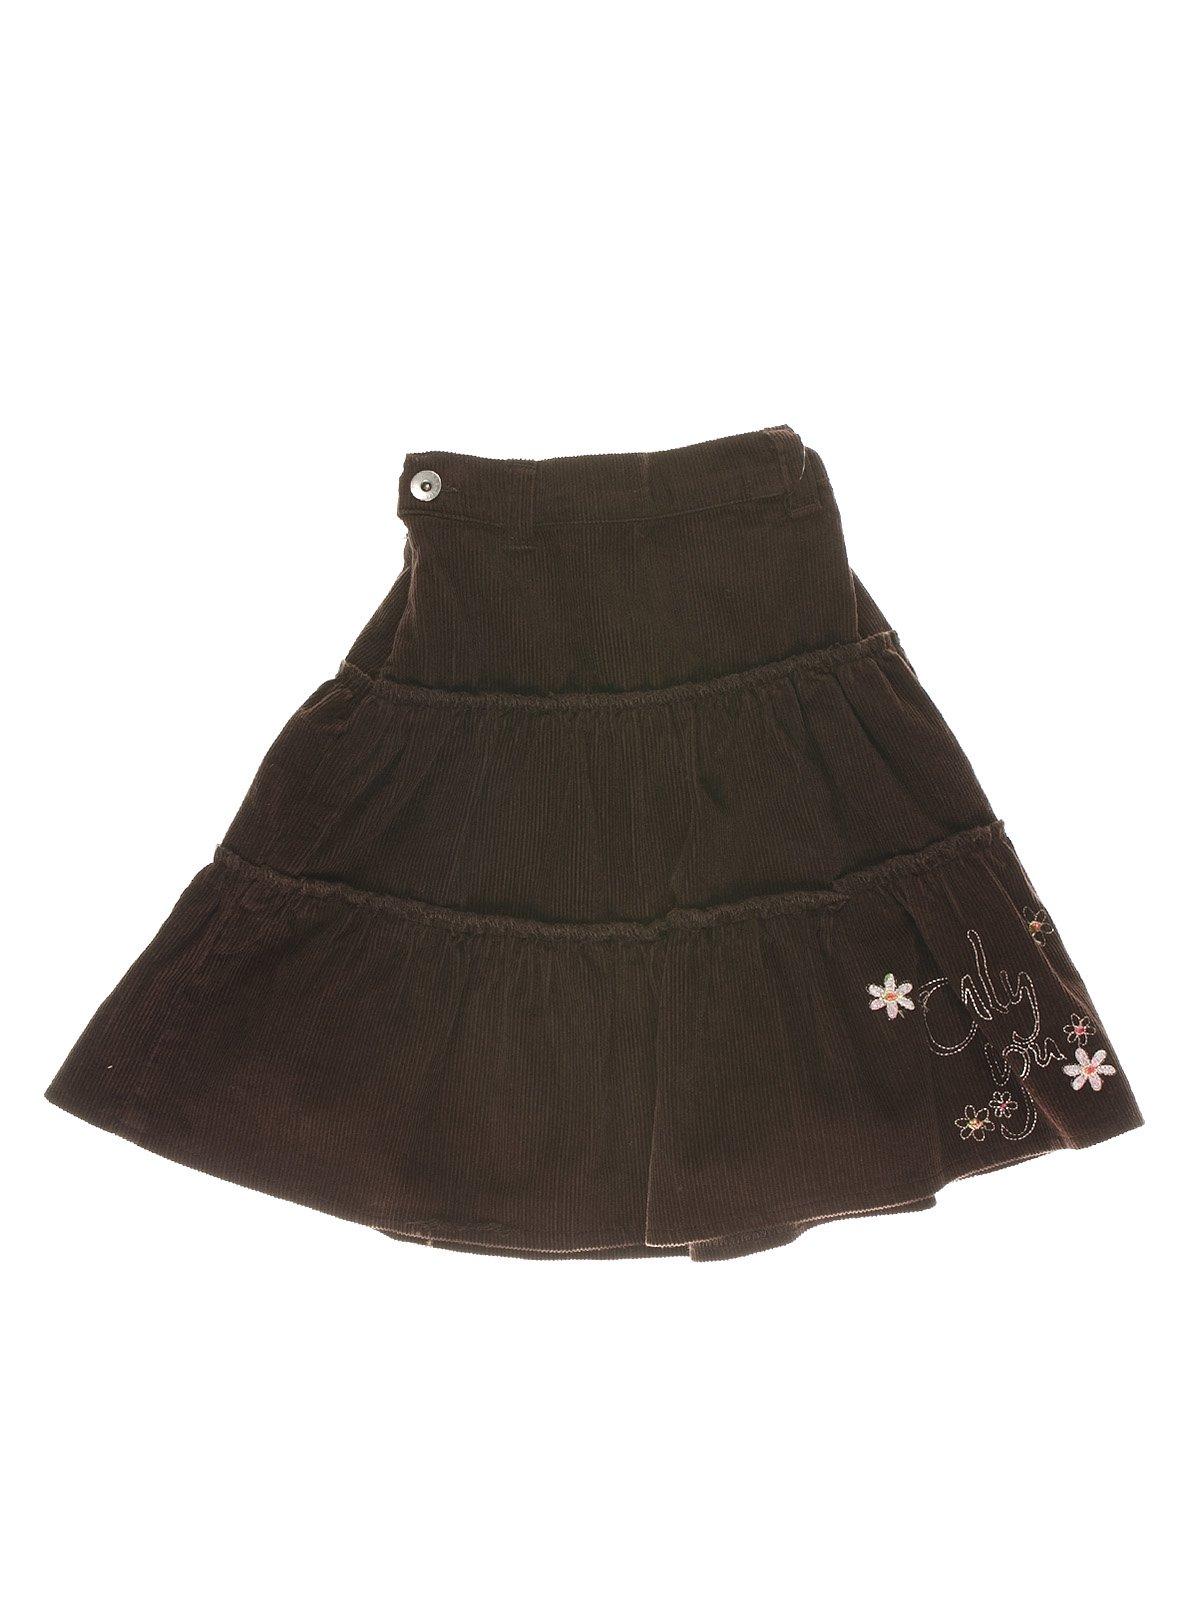 Юбка темно-коричневая с декором   1364780